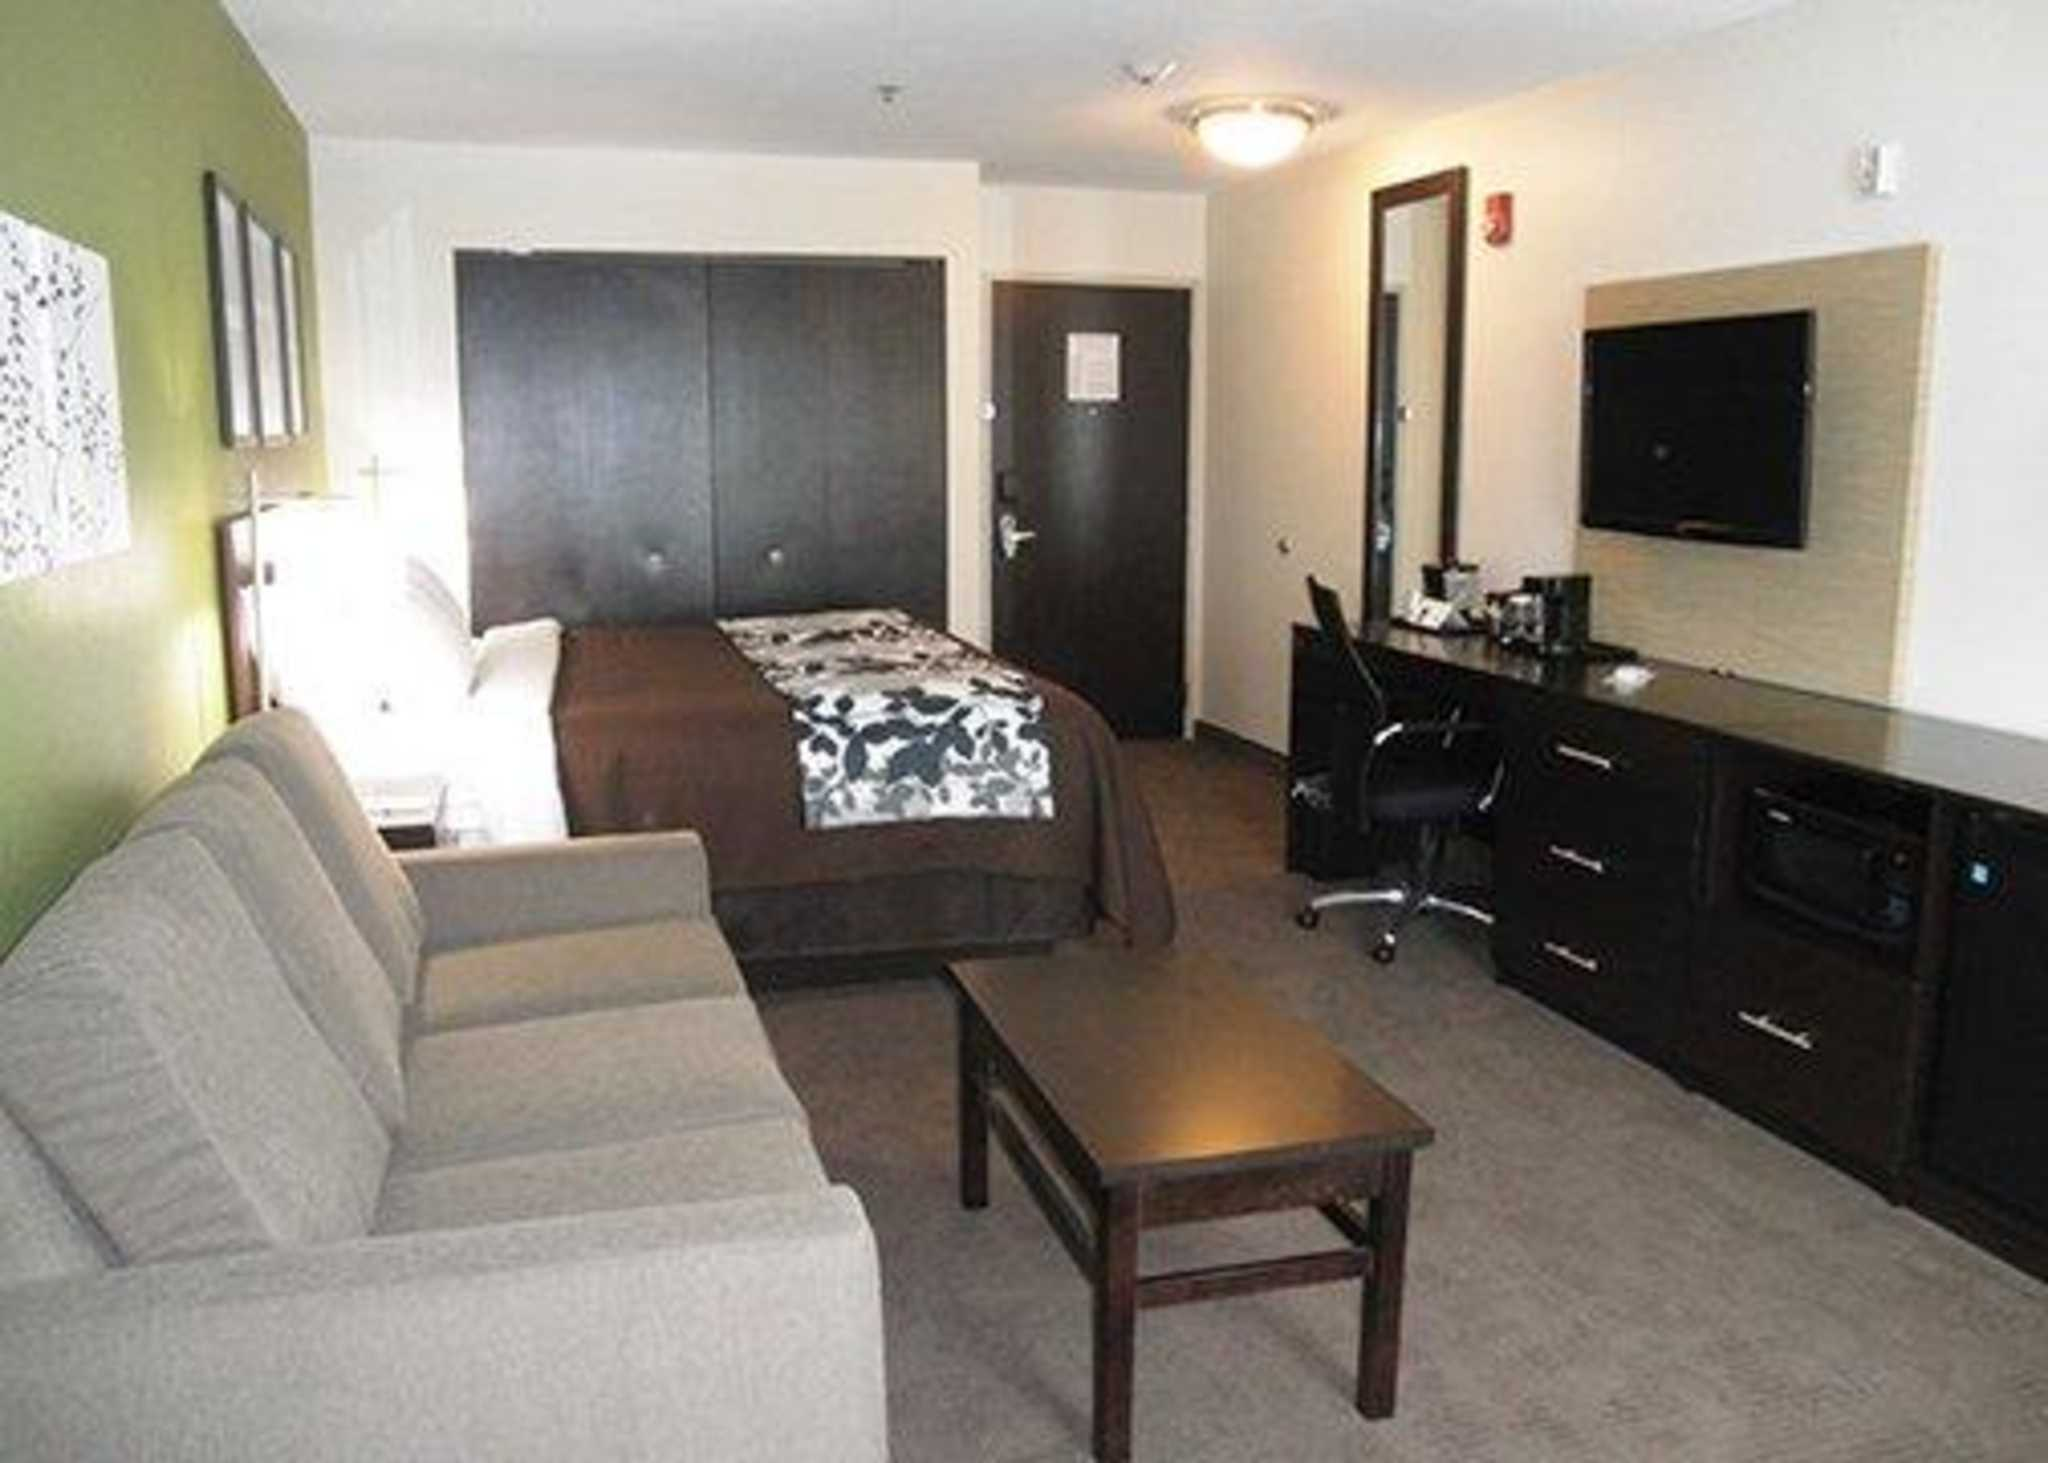 Sleep Inn & Suites Belmont / St. Clairsville image 7